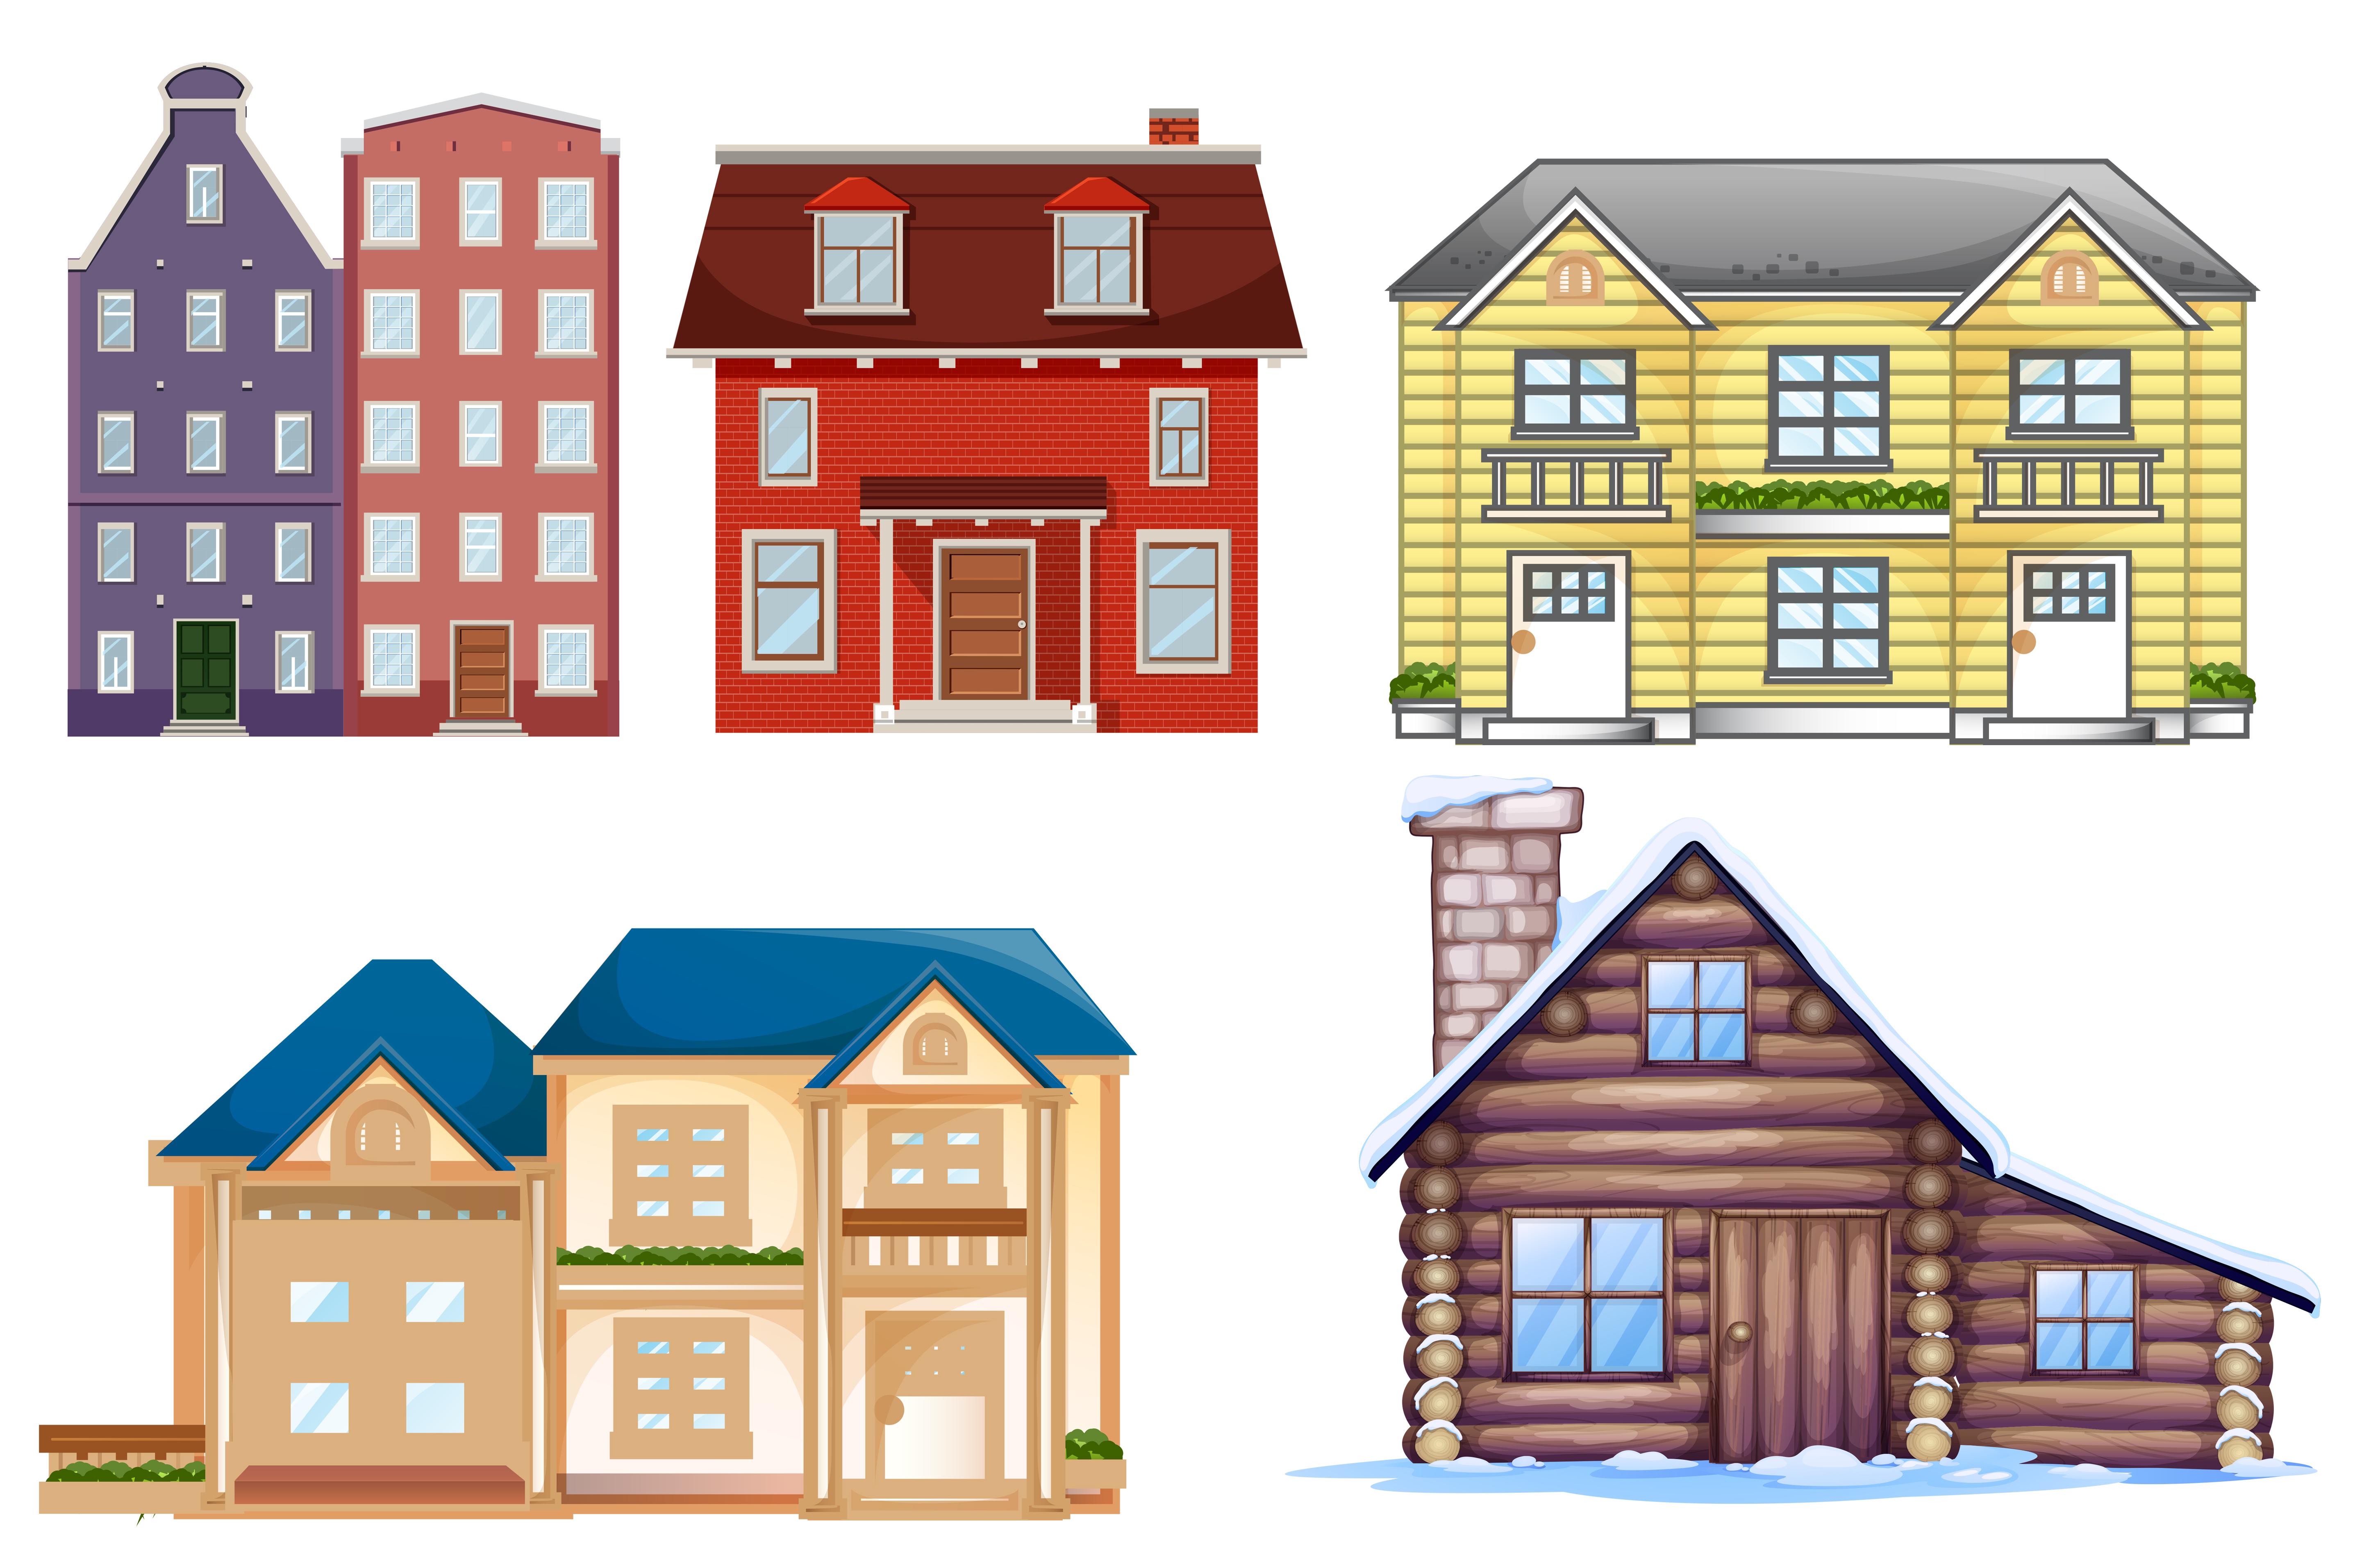 Set of different building - Download Free Vectors, Clipart Graphics & Vector Art